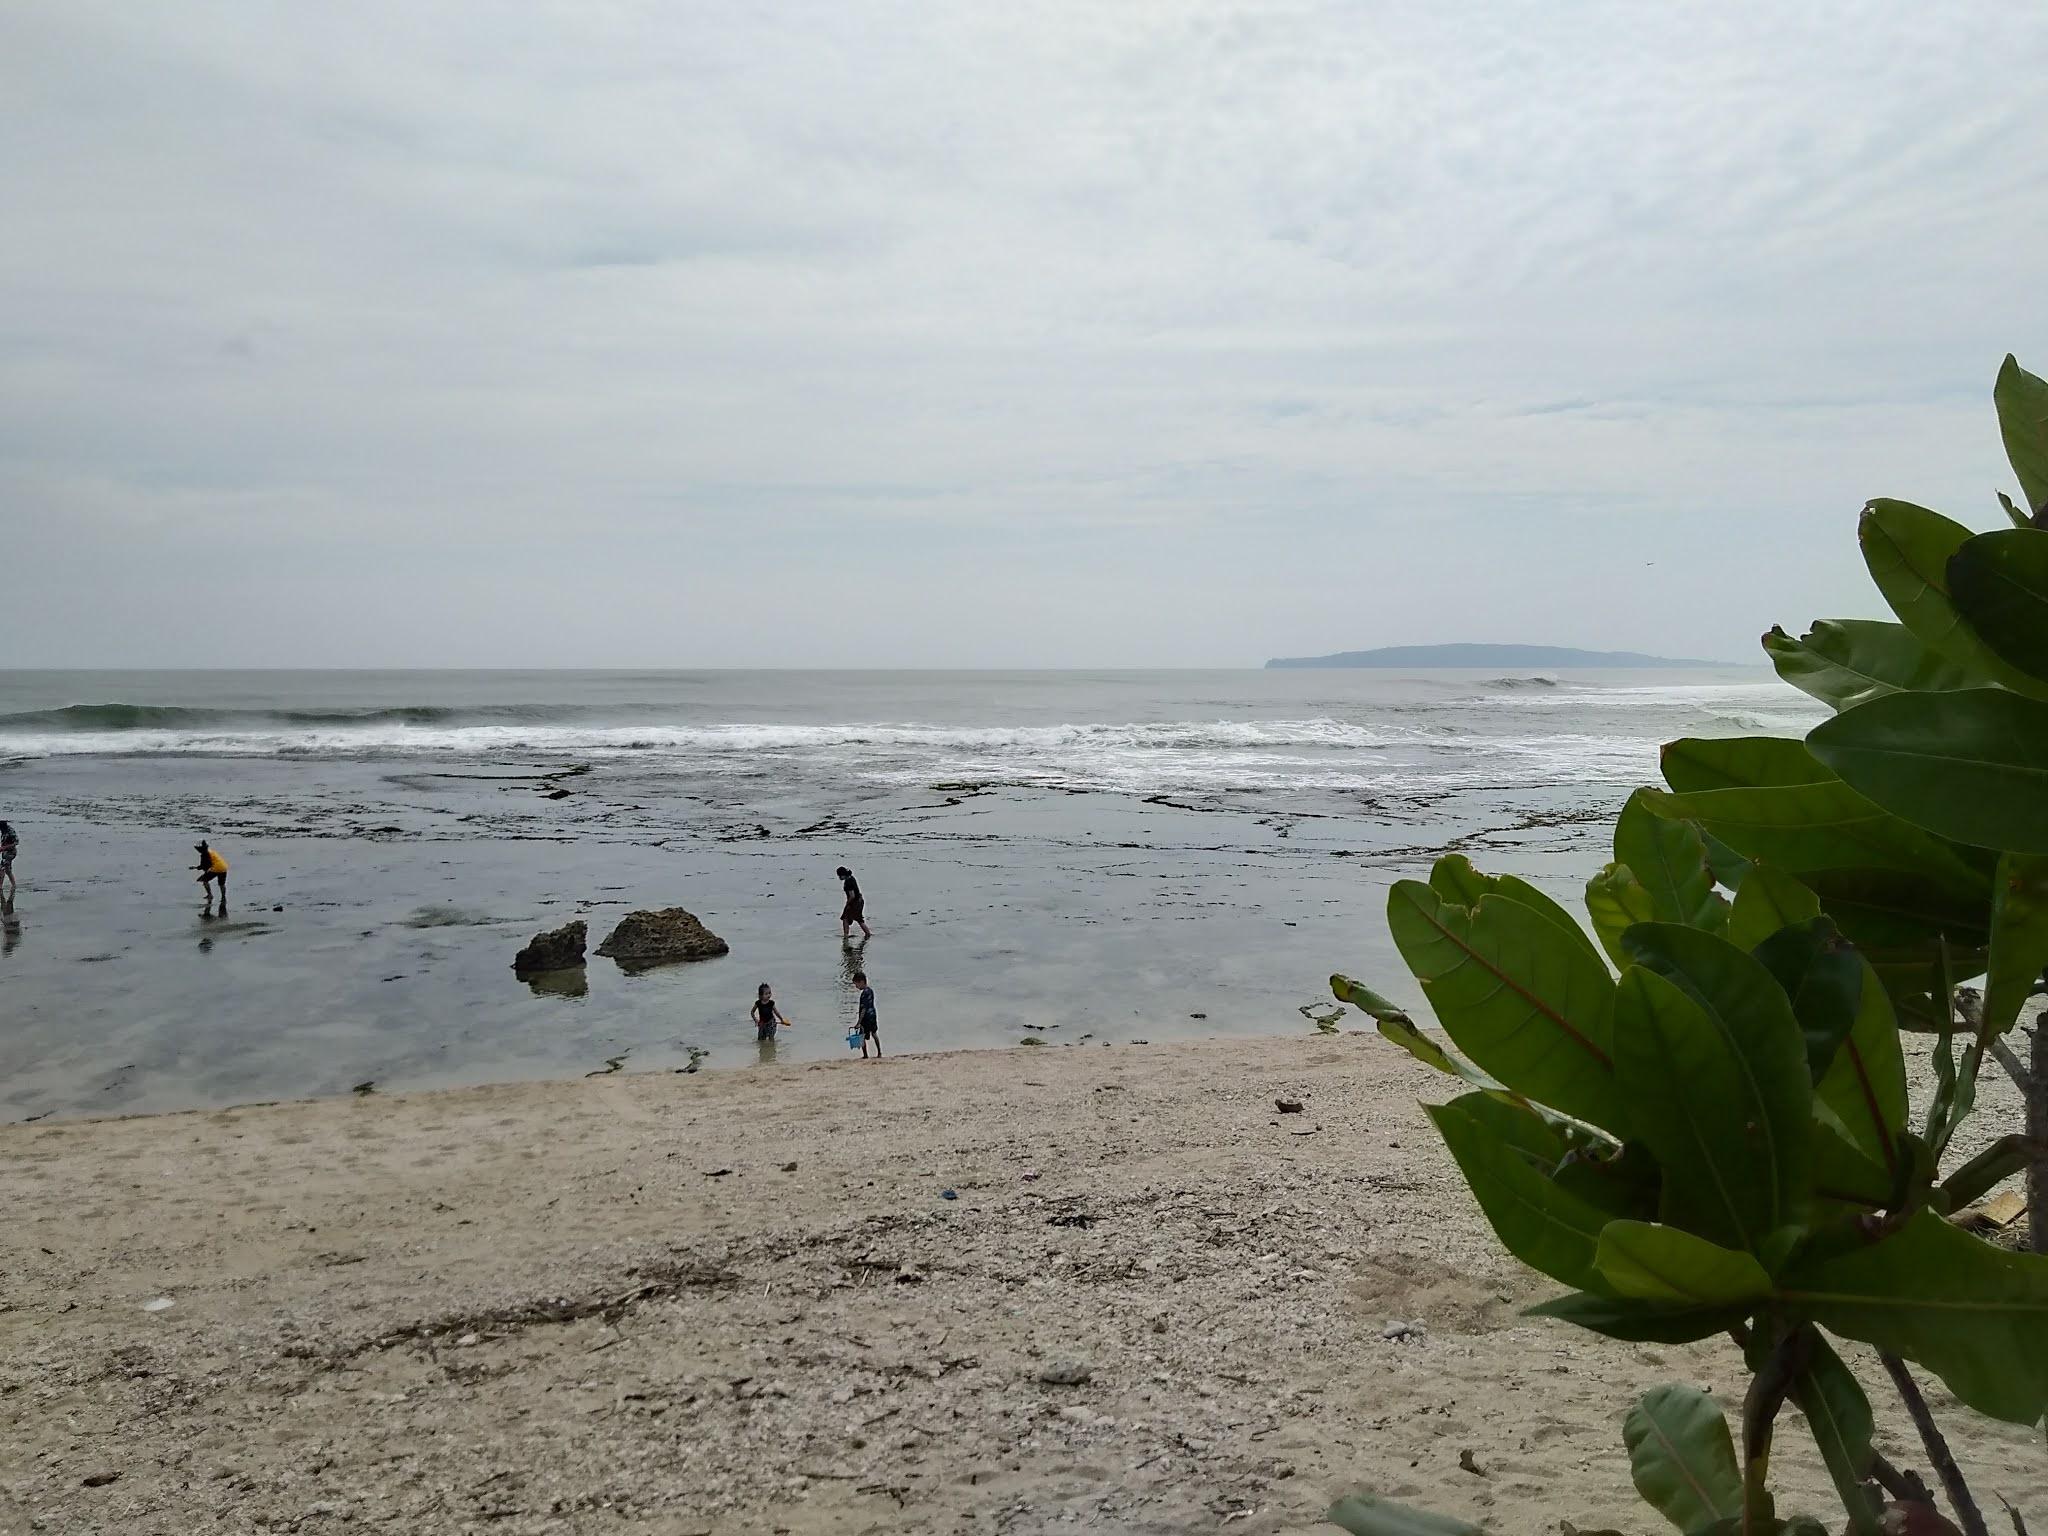 pantai karapyak lokasi kedua